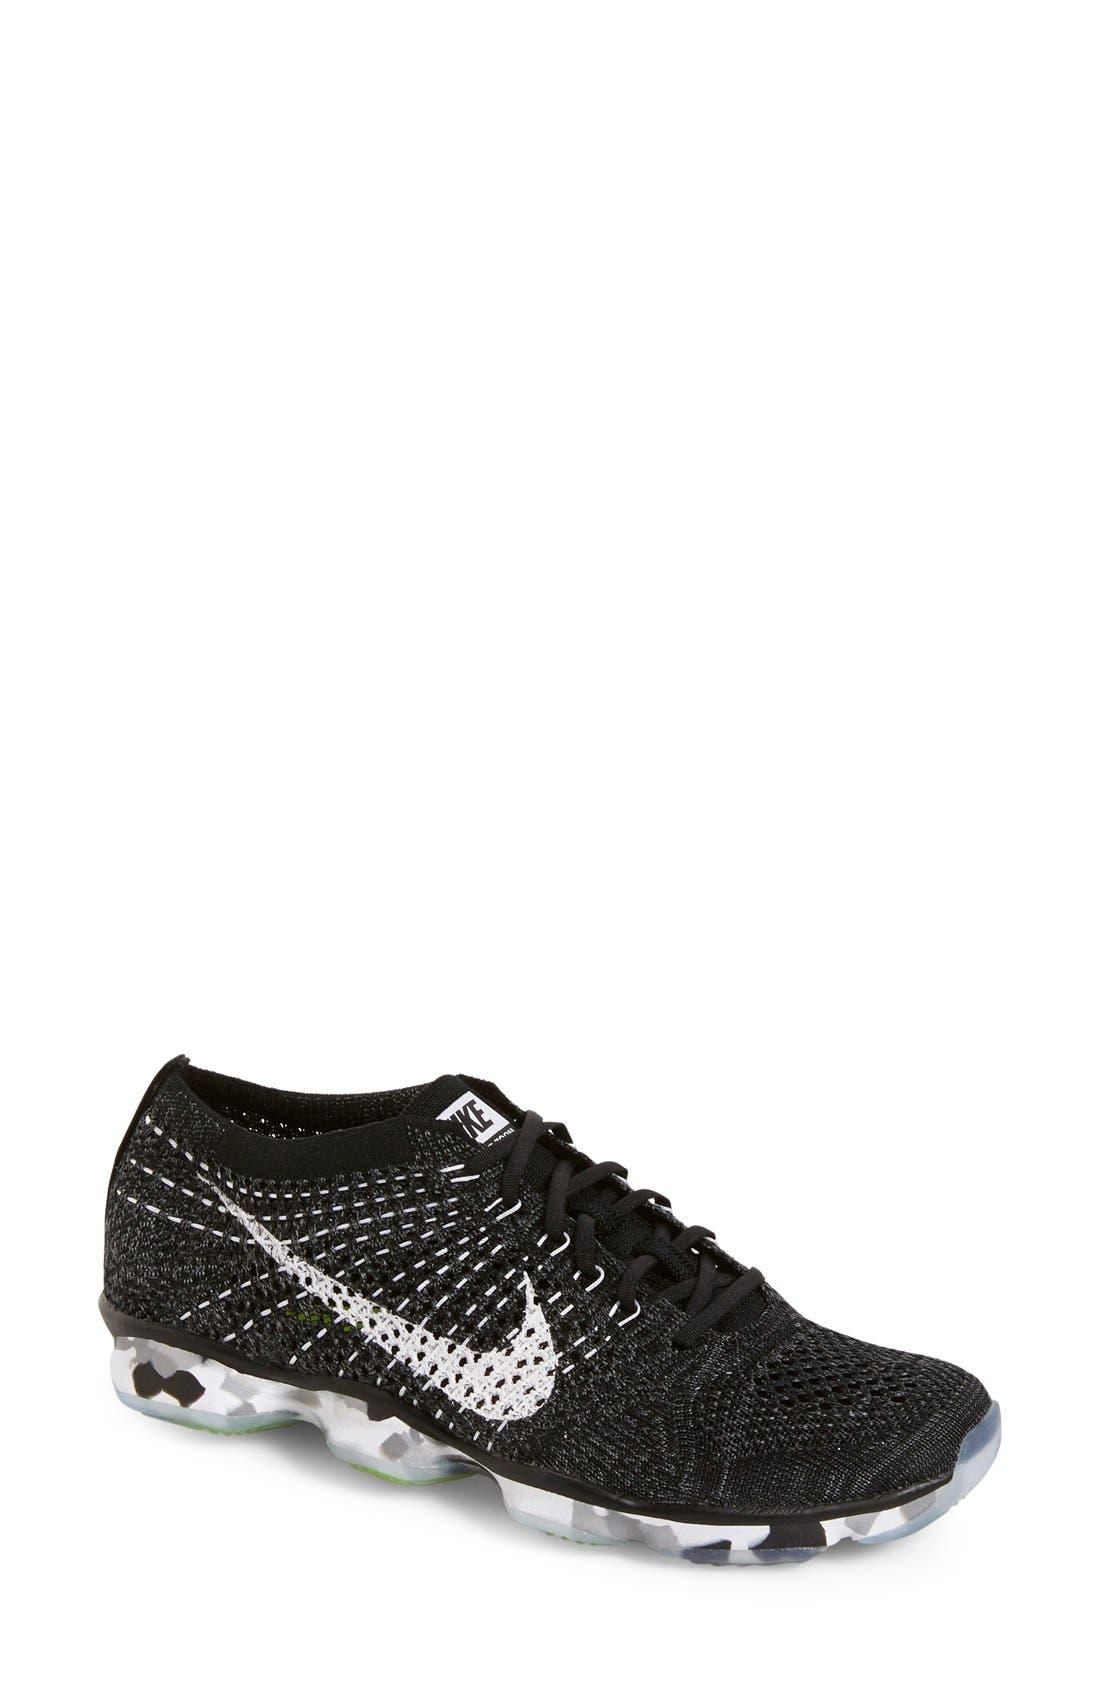 Main Image - Nike 'Flyknit Zoom' Agility Training Shoe (Women)